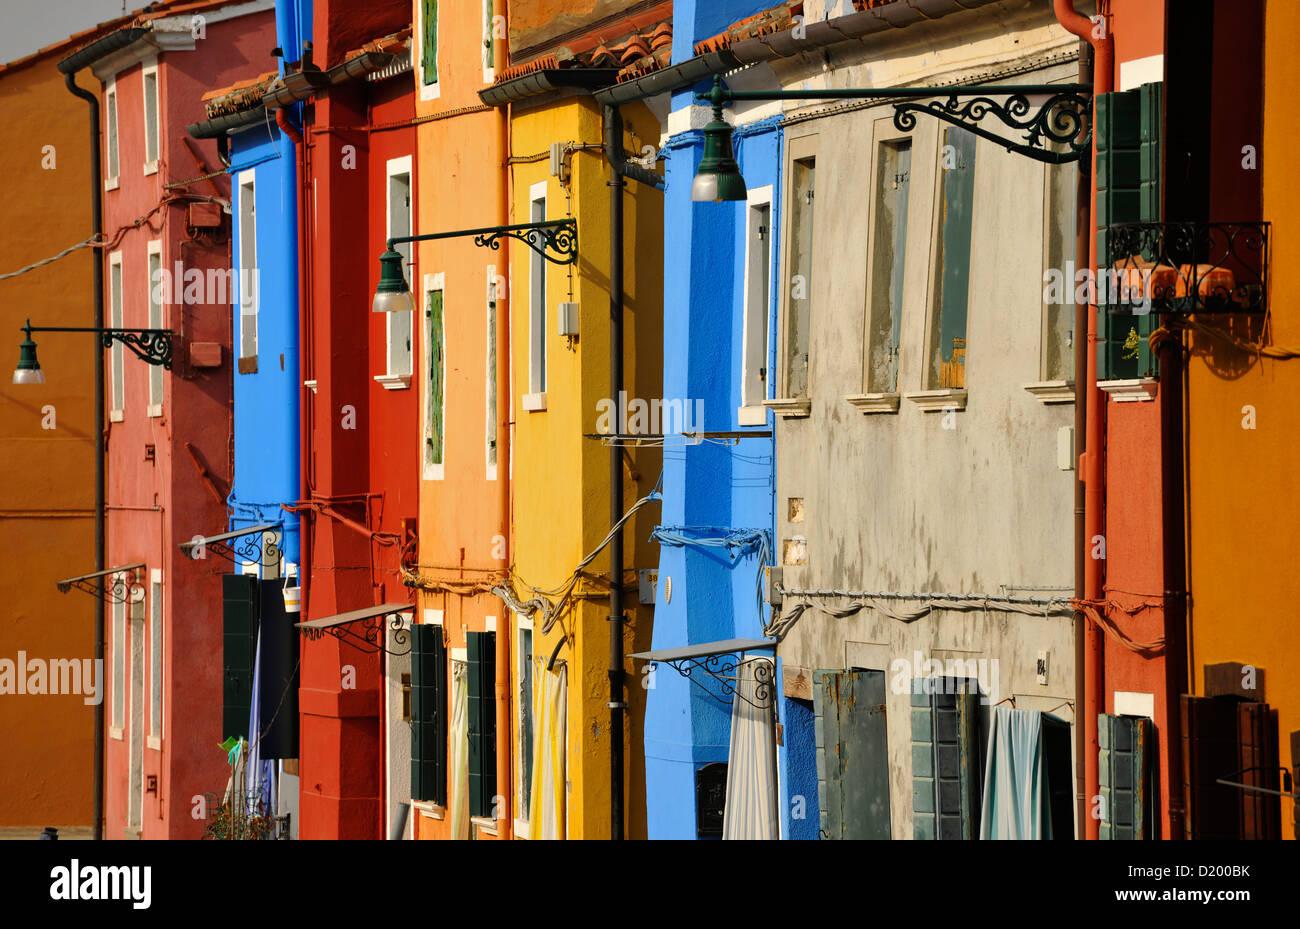 Bunte Haeuser, Insel Burano, Lagune von Venedig, Veneto, Venedig, Italien Stockbild